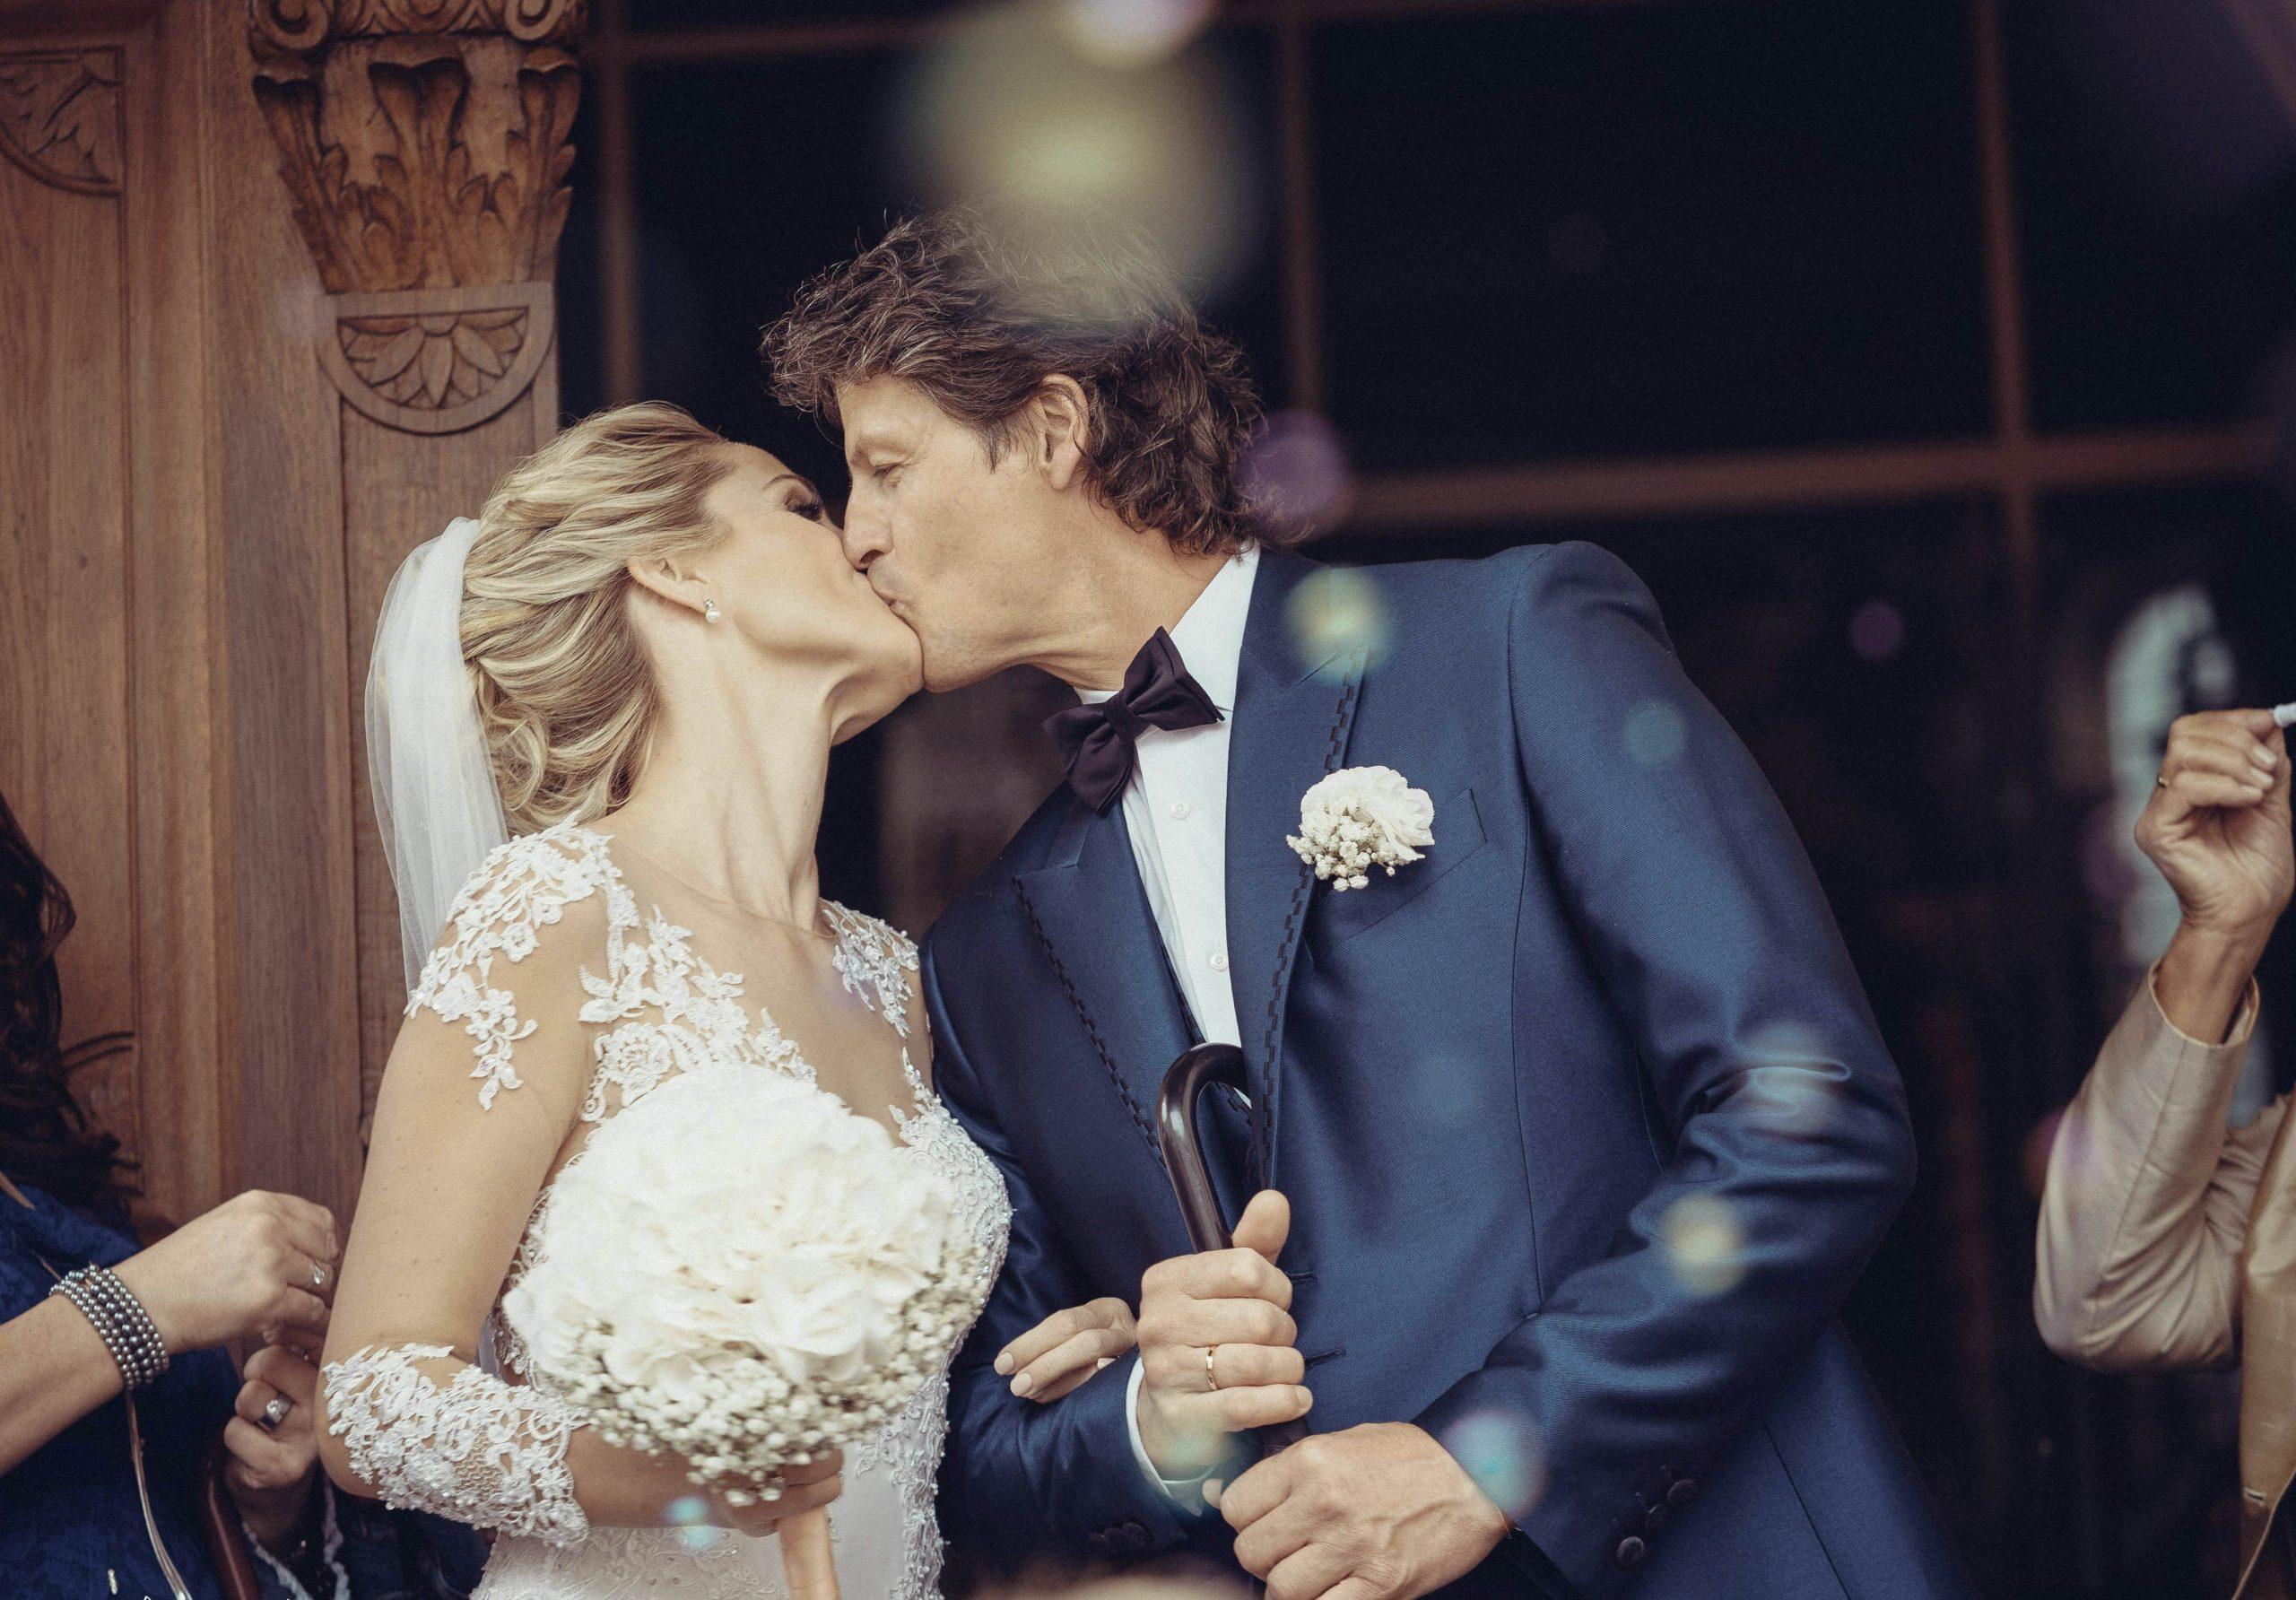 Benno Rottonara | Hochzeitsfilmer